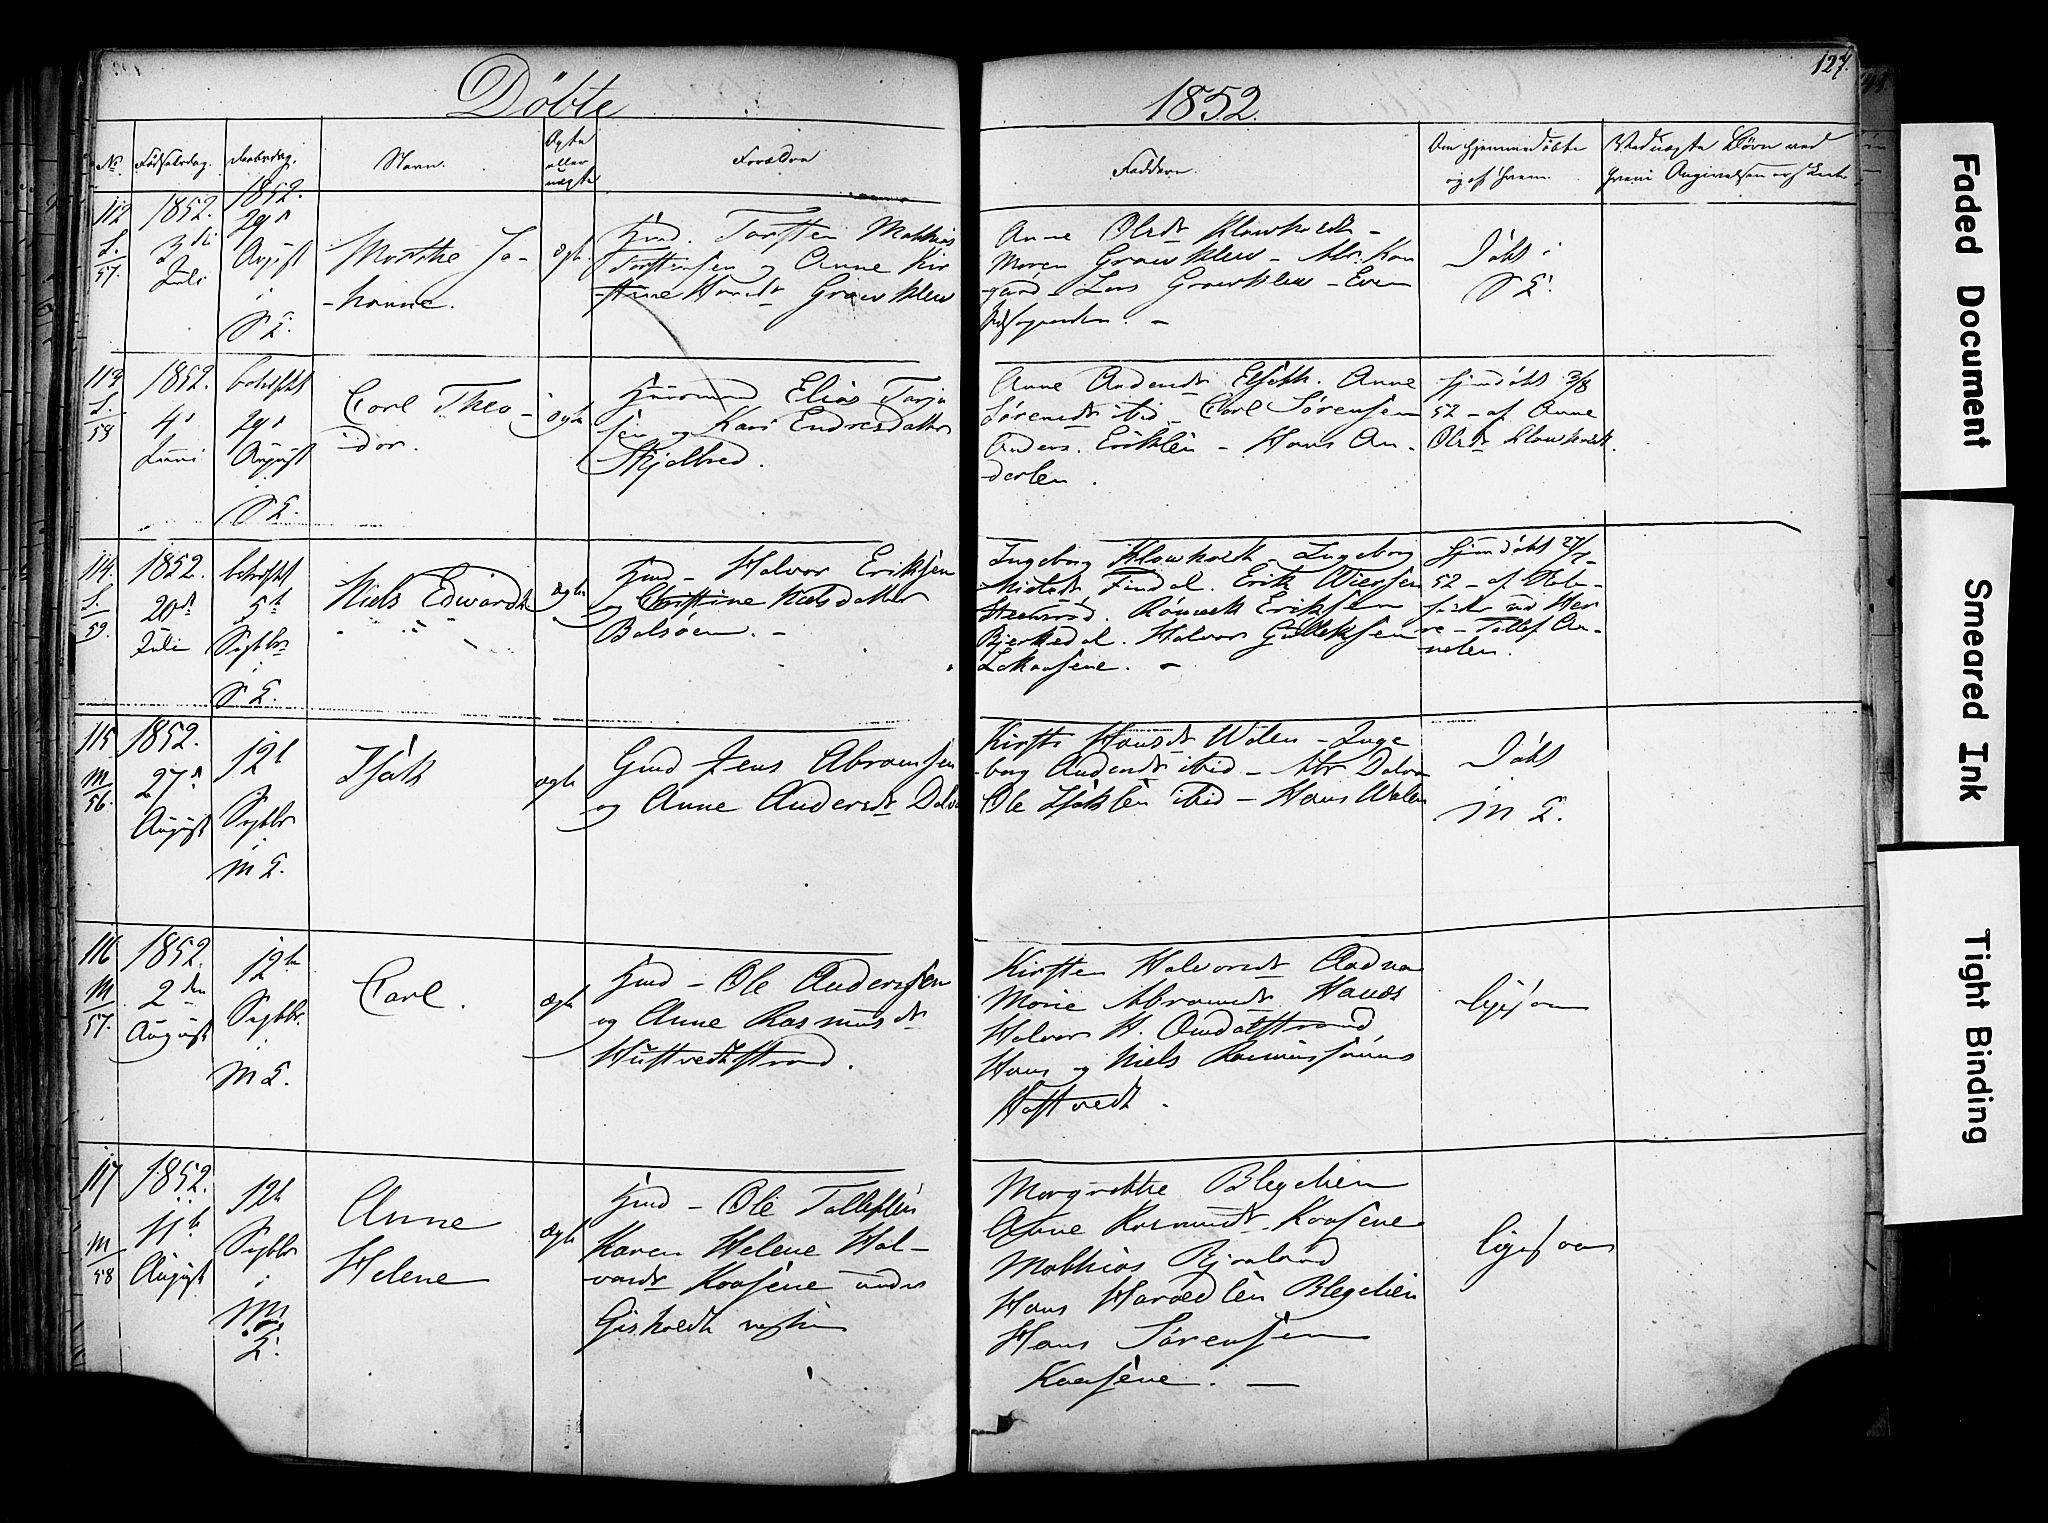 SAKO, Solum kirkebøker, F/Fa/L0006: Ministerialbok nr. I 6, 1844-1855, s. 127